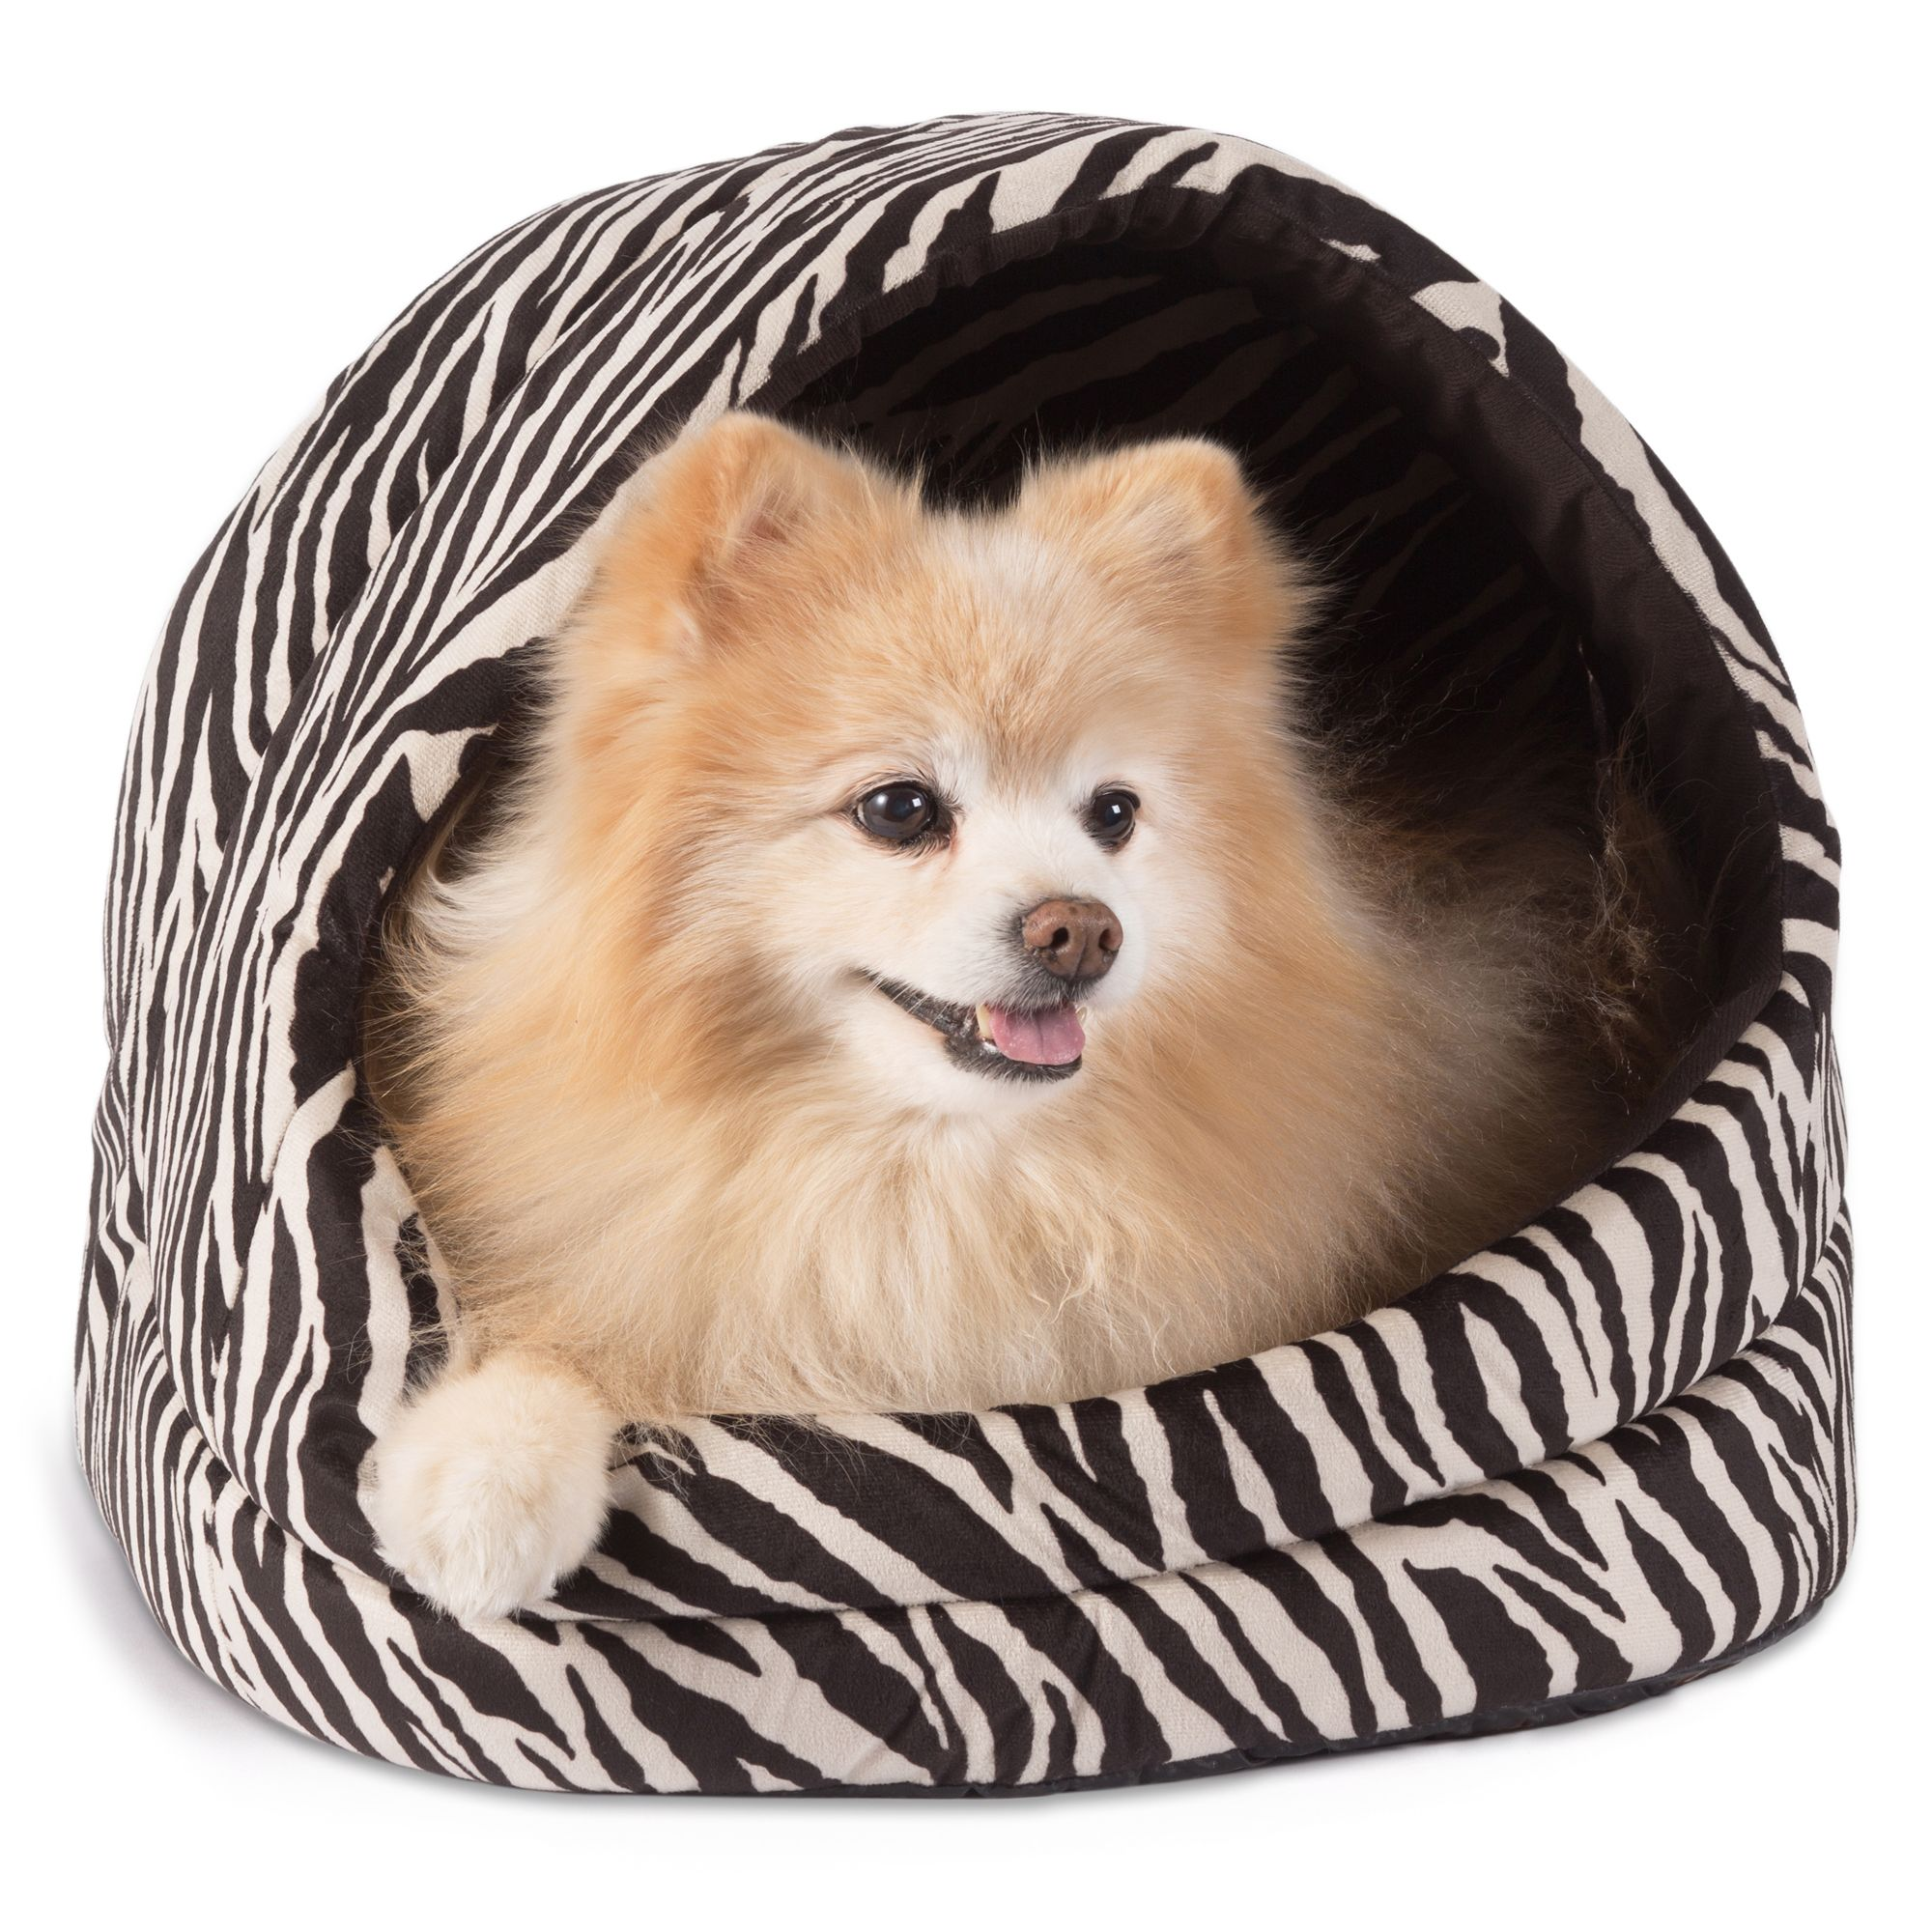 "Best Friends by Sheri Zebra Pet Hut size: 13""L x 16""W x 15""H"